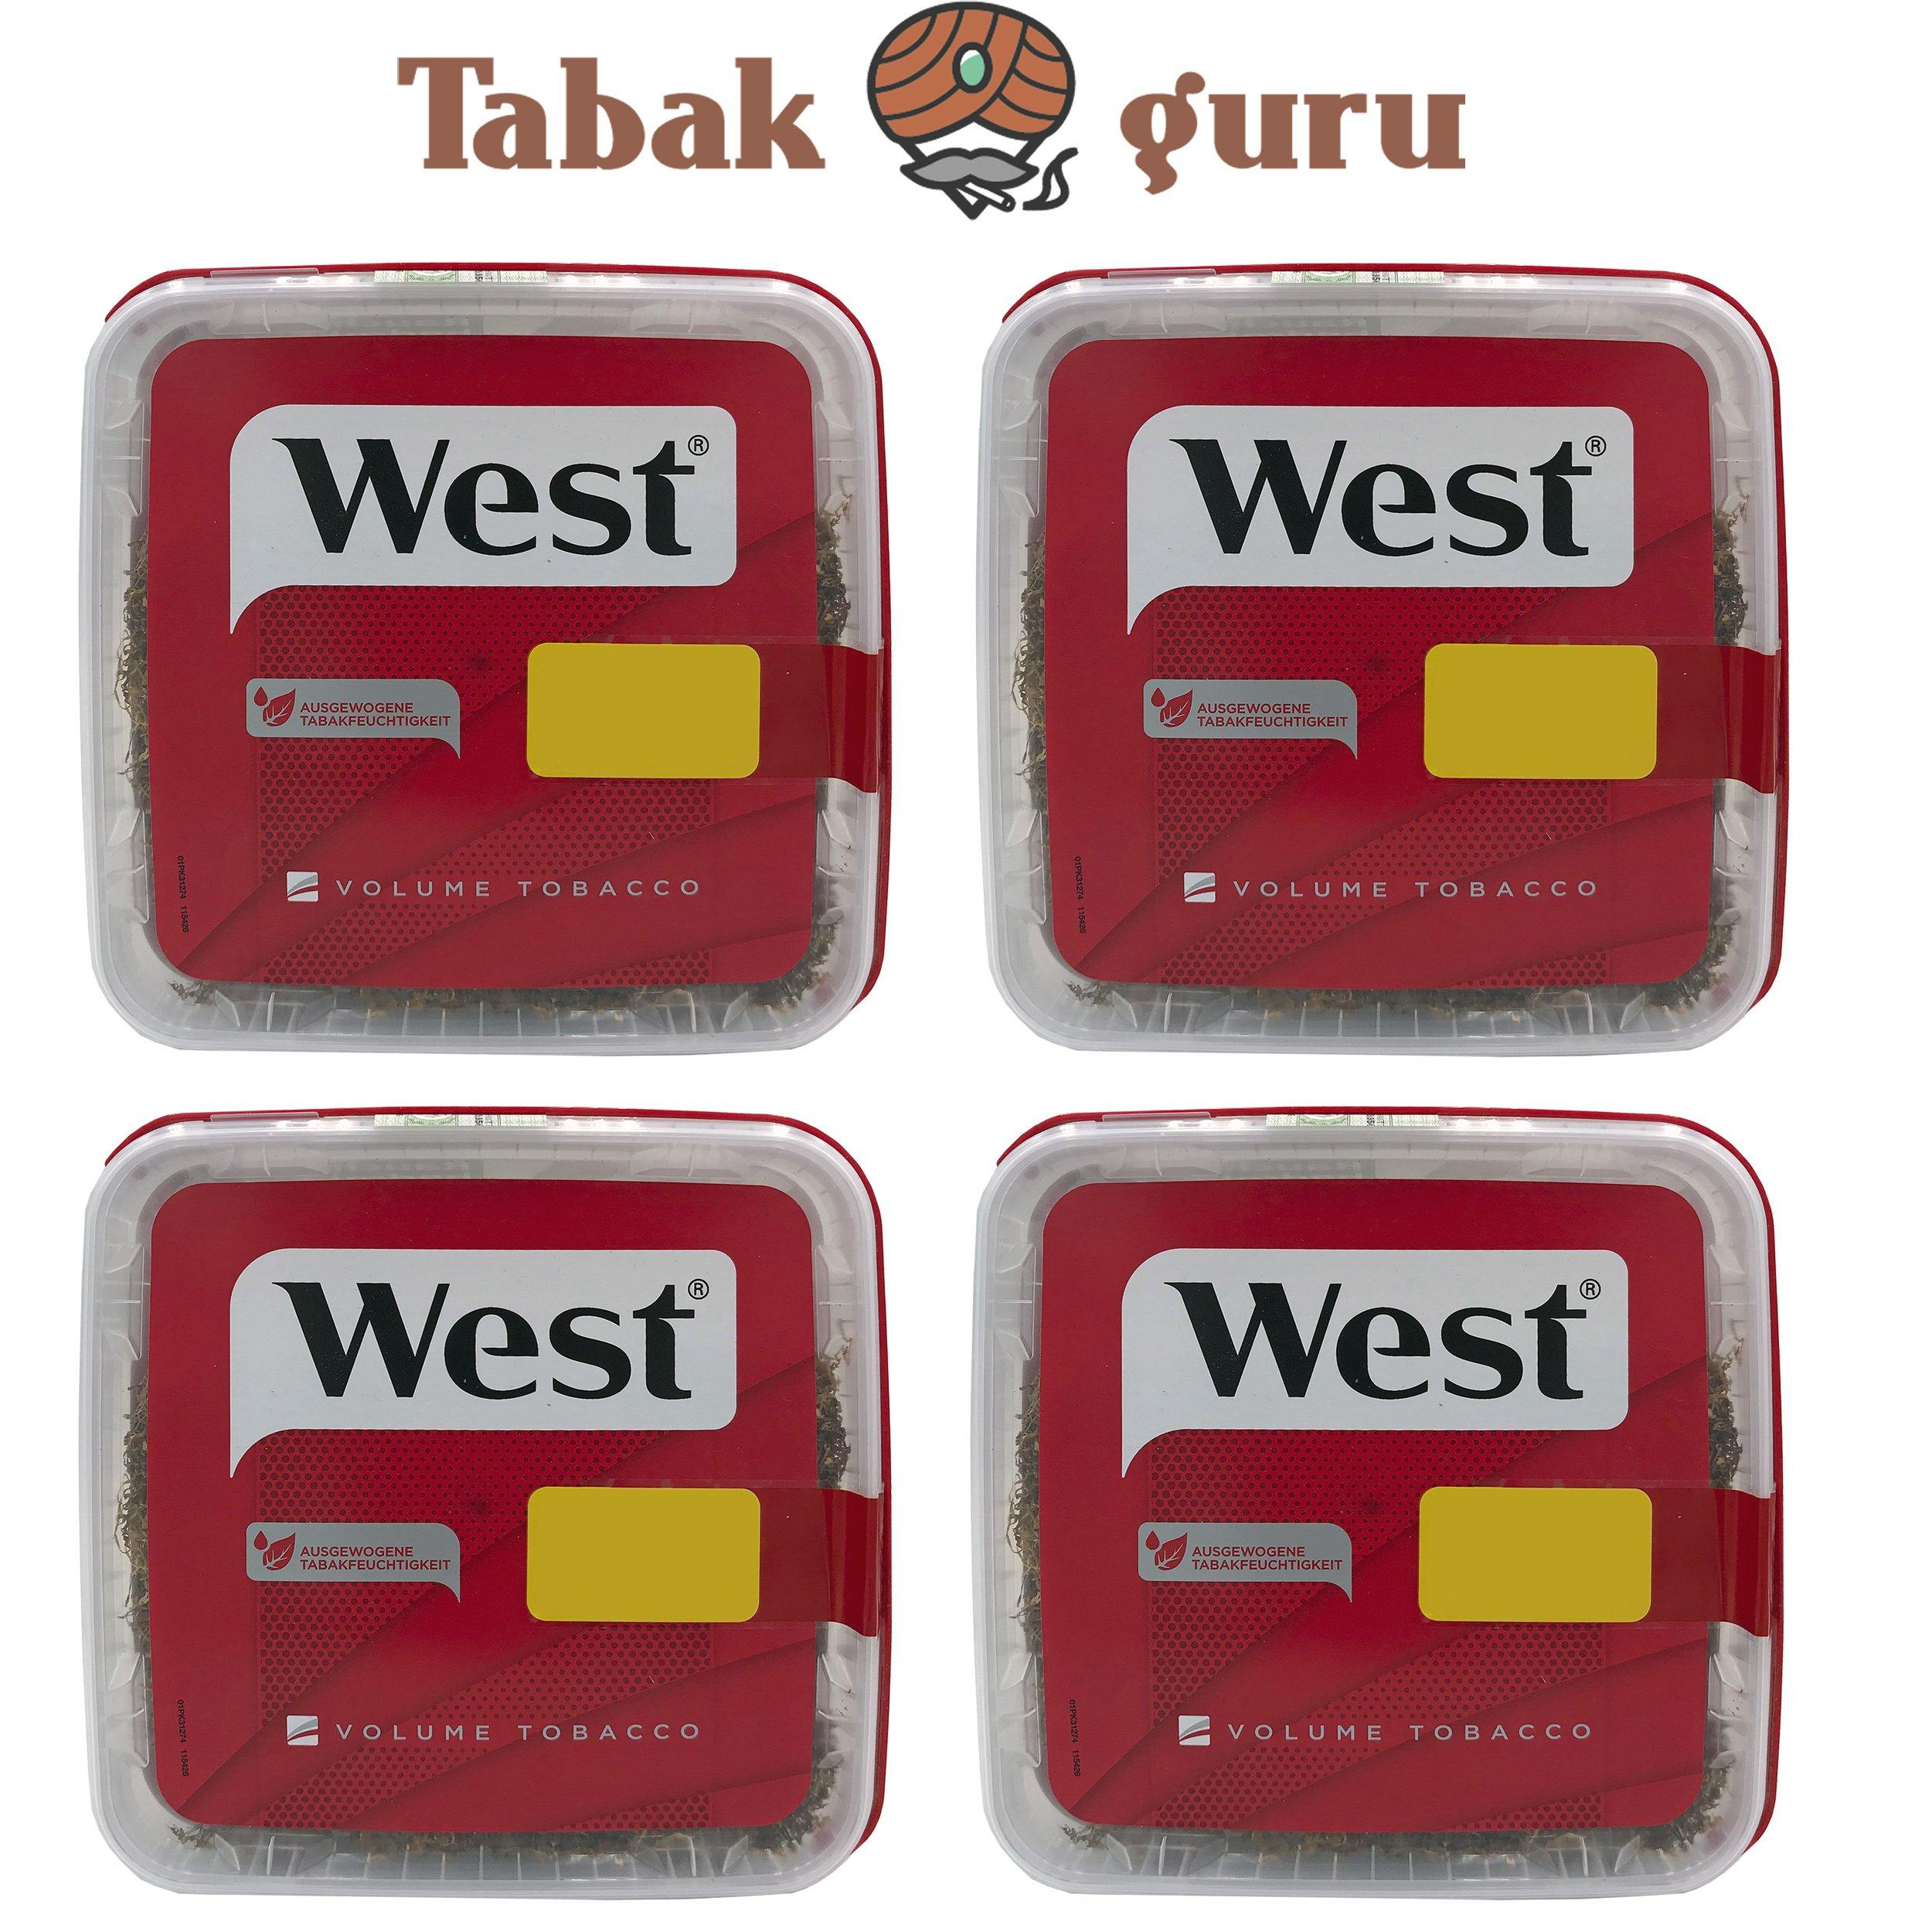 4x West Rot Tabak Eimer - Boxes á 170 g Volumentabak / Zigarettentabak